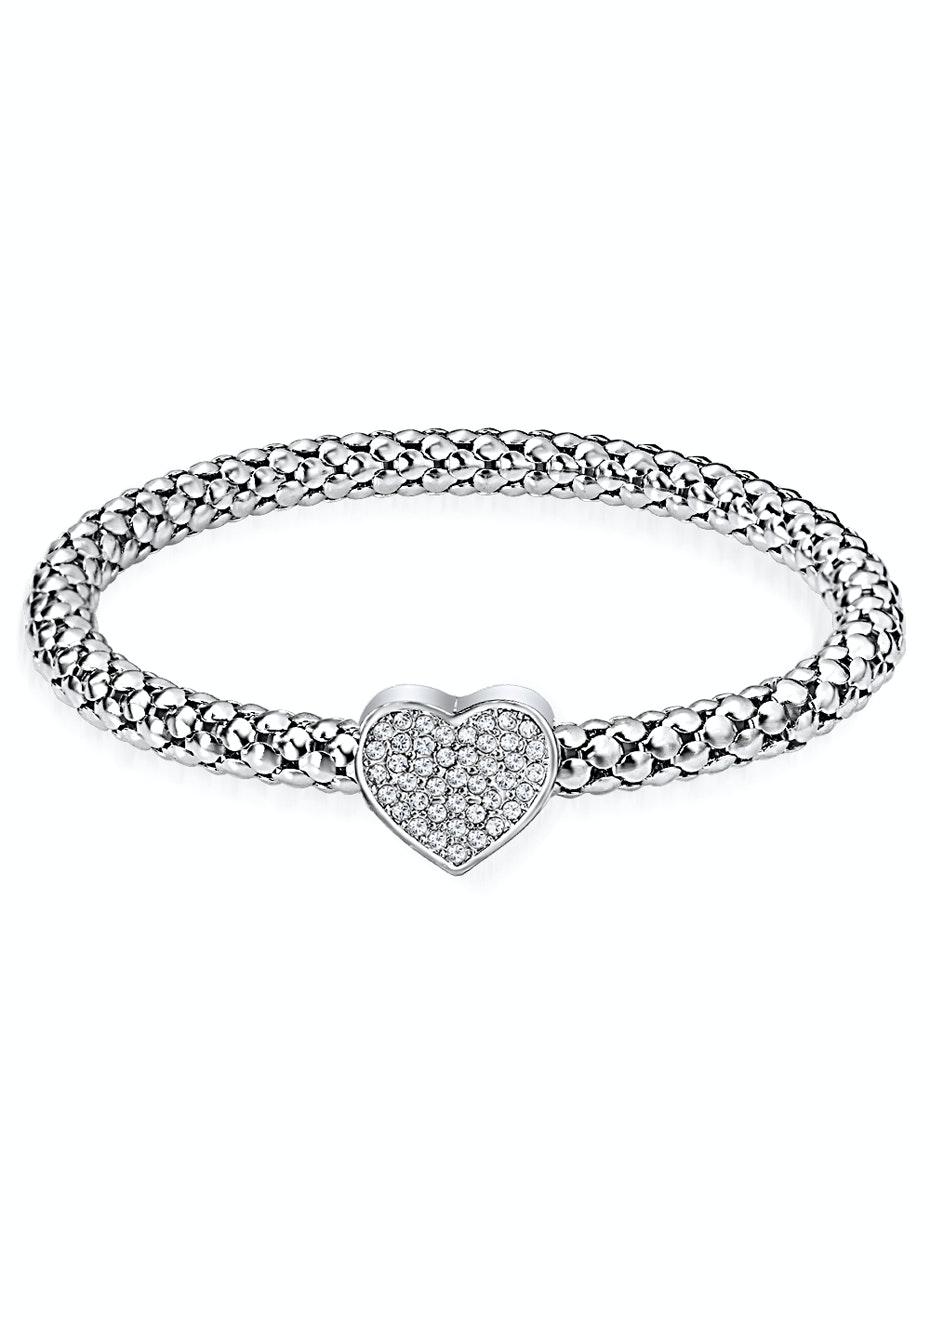 Heart Bracelet Ft Swarovski Elements